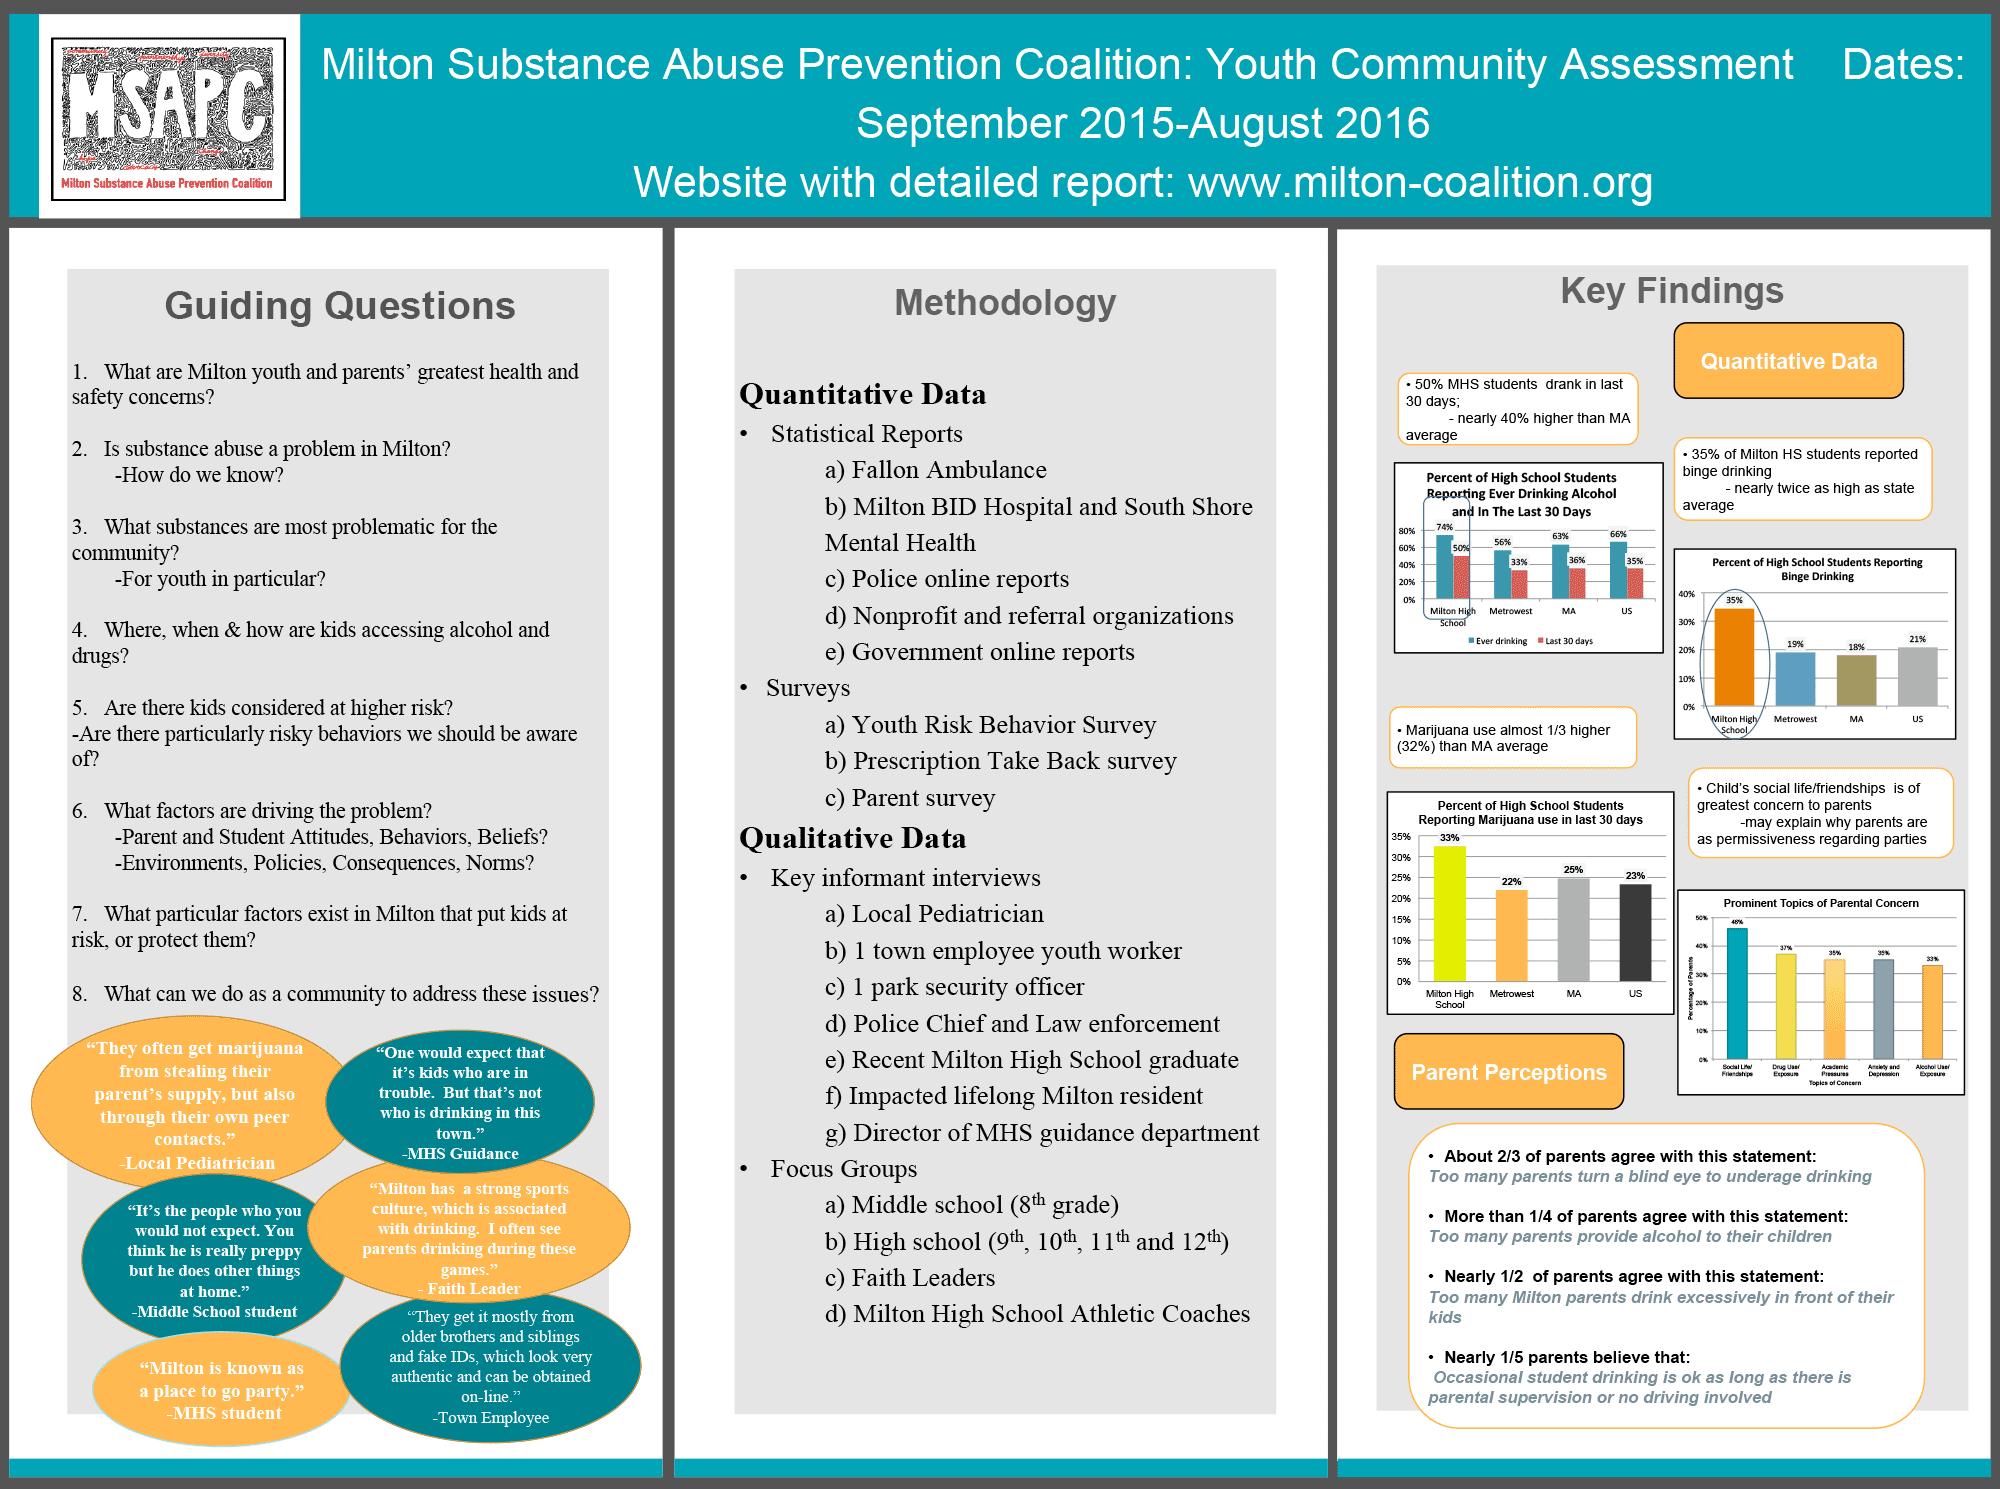 MSAPC Community Assessment Overview